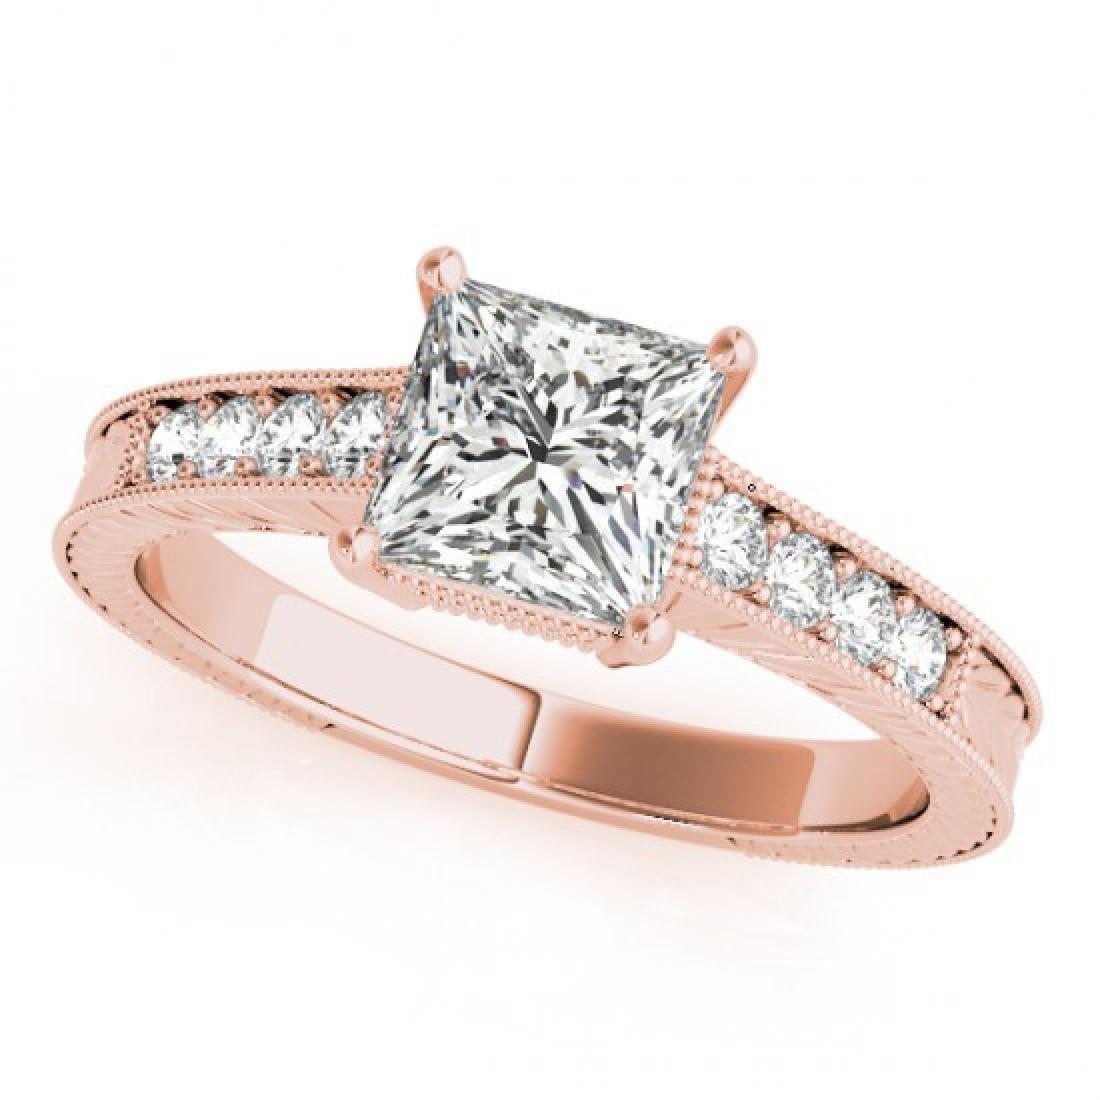 1.5 CTW Certified VS/SI Princess Diamond Solitaire